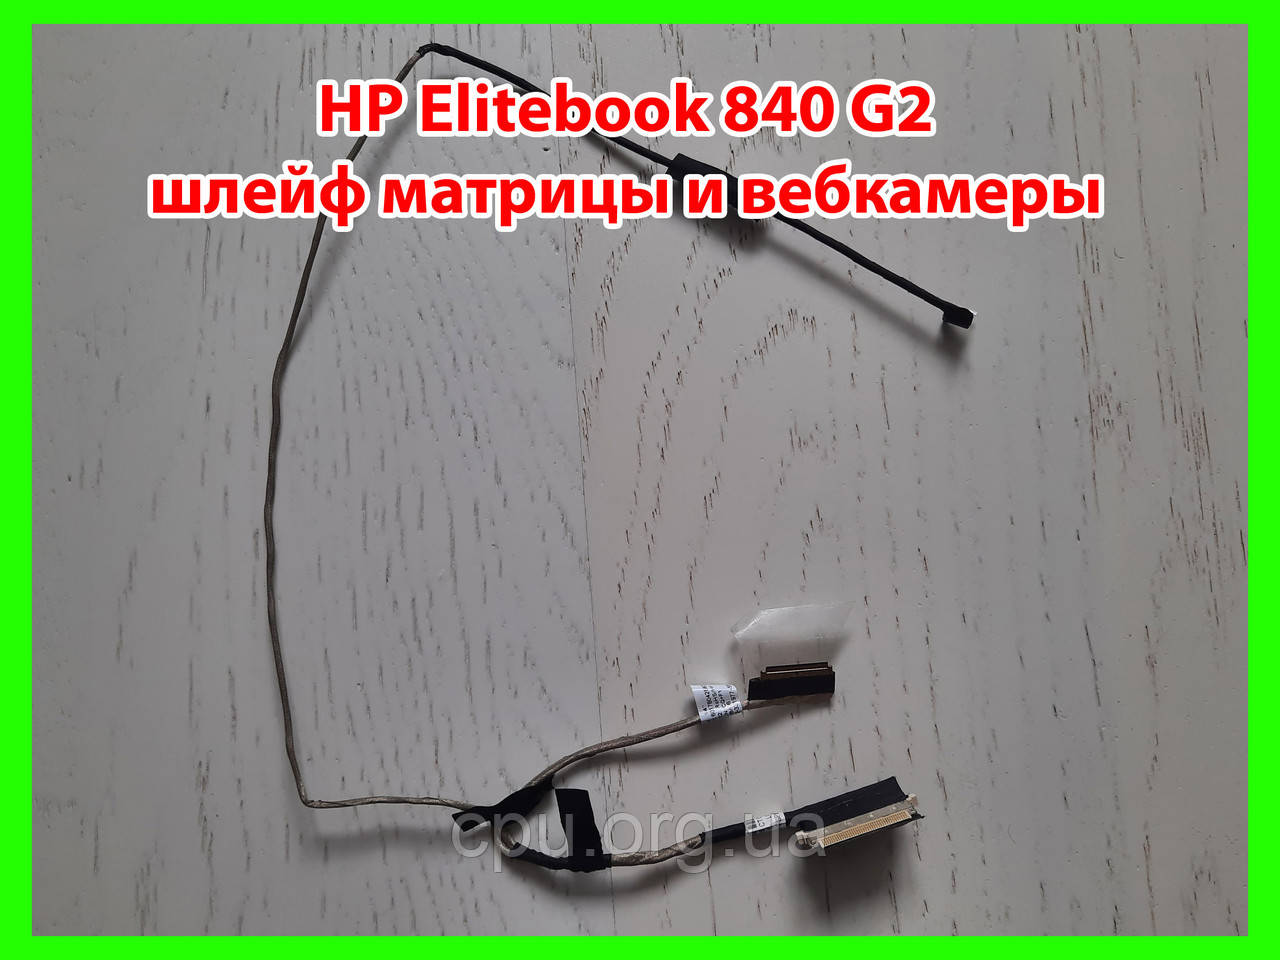 Шлейф матрицы и вебкамеры HP Elitebook 840 G2 765816-001